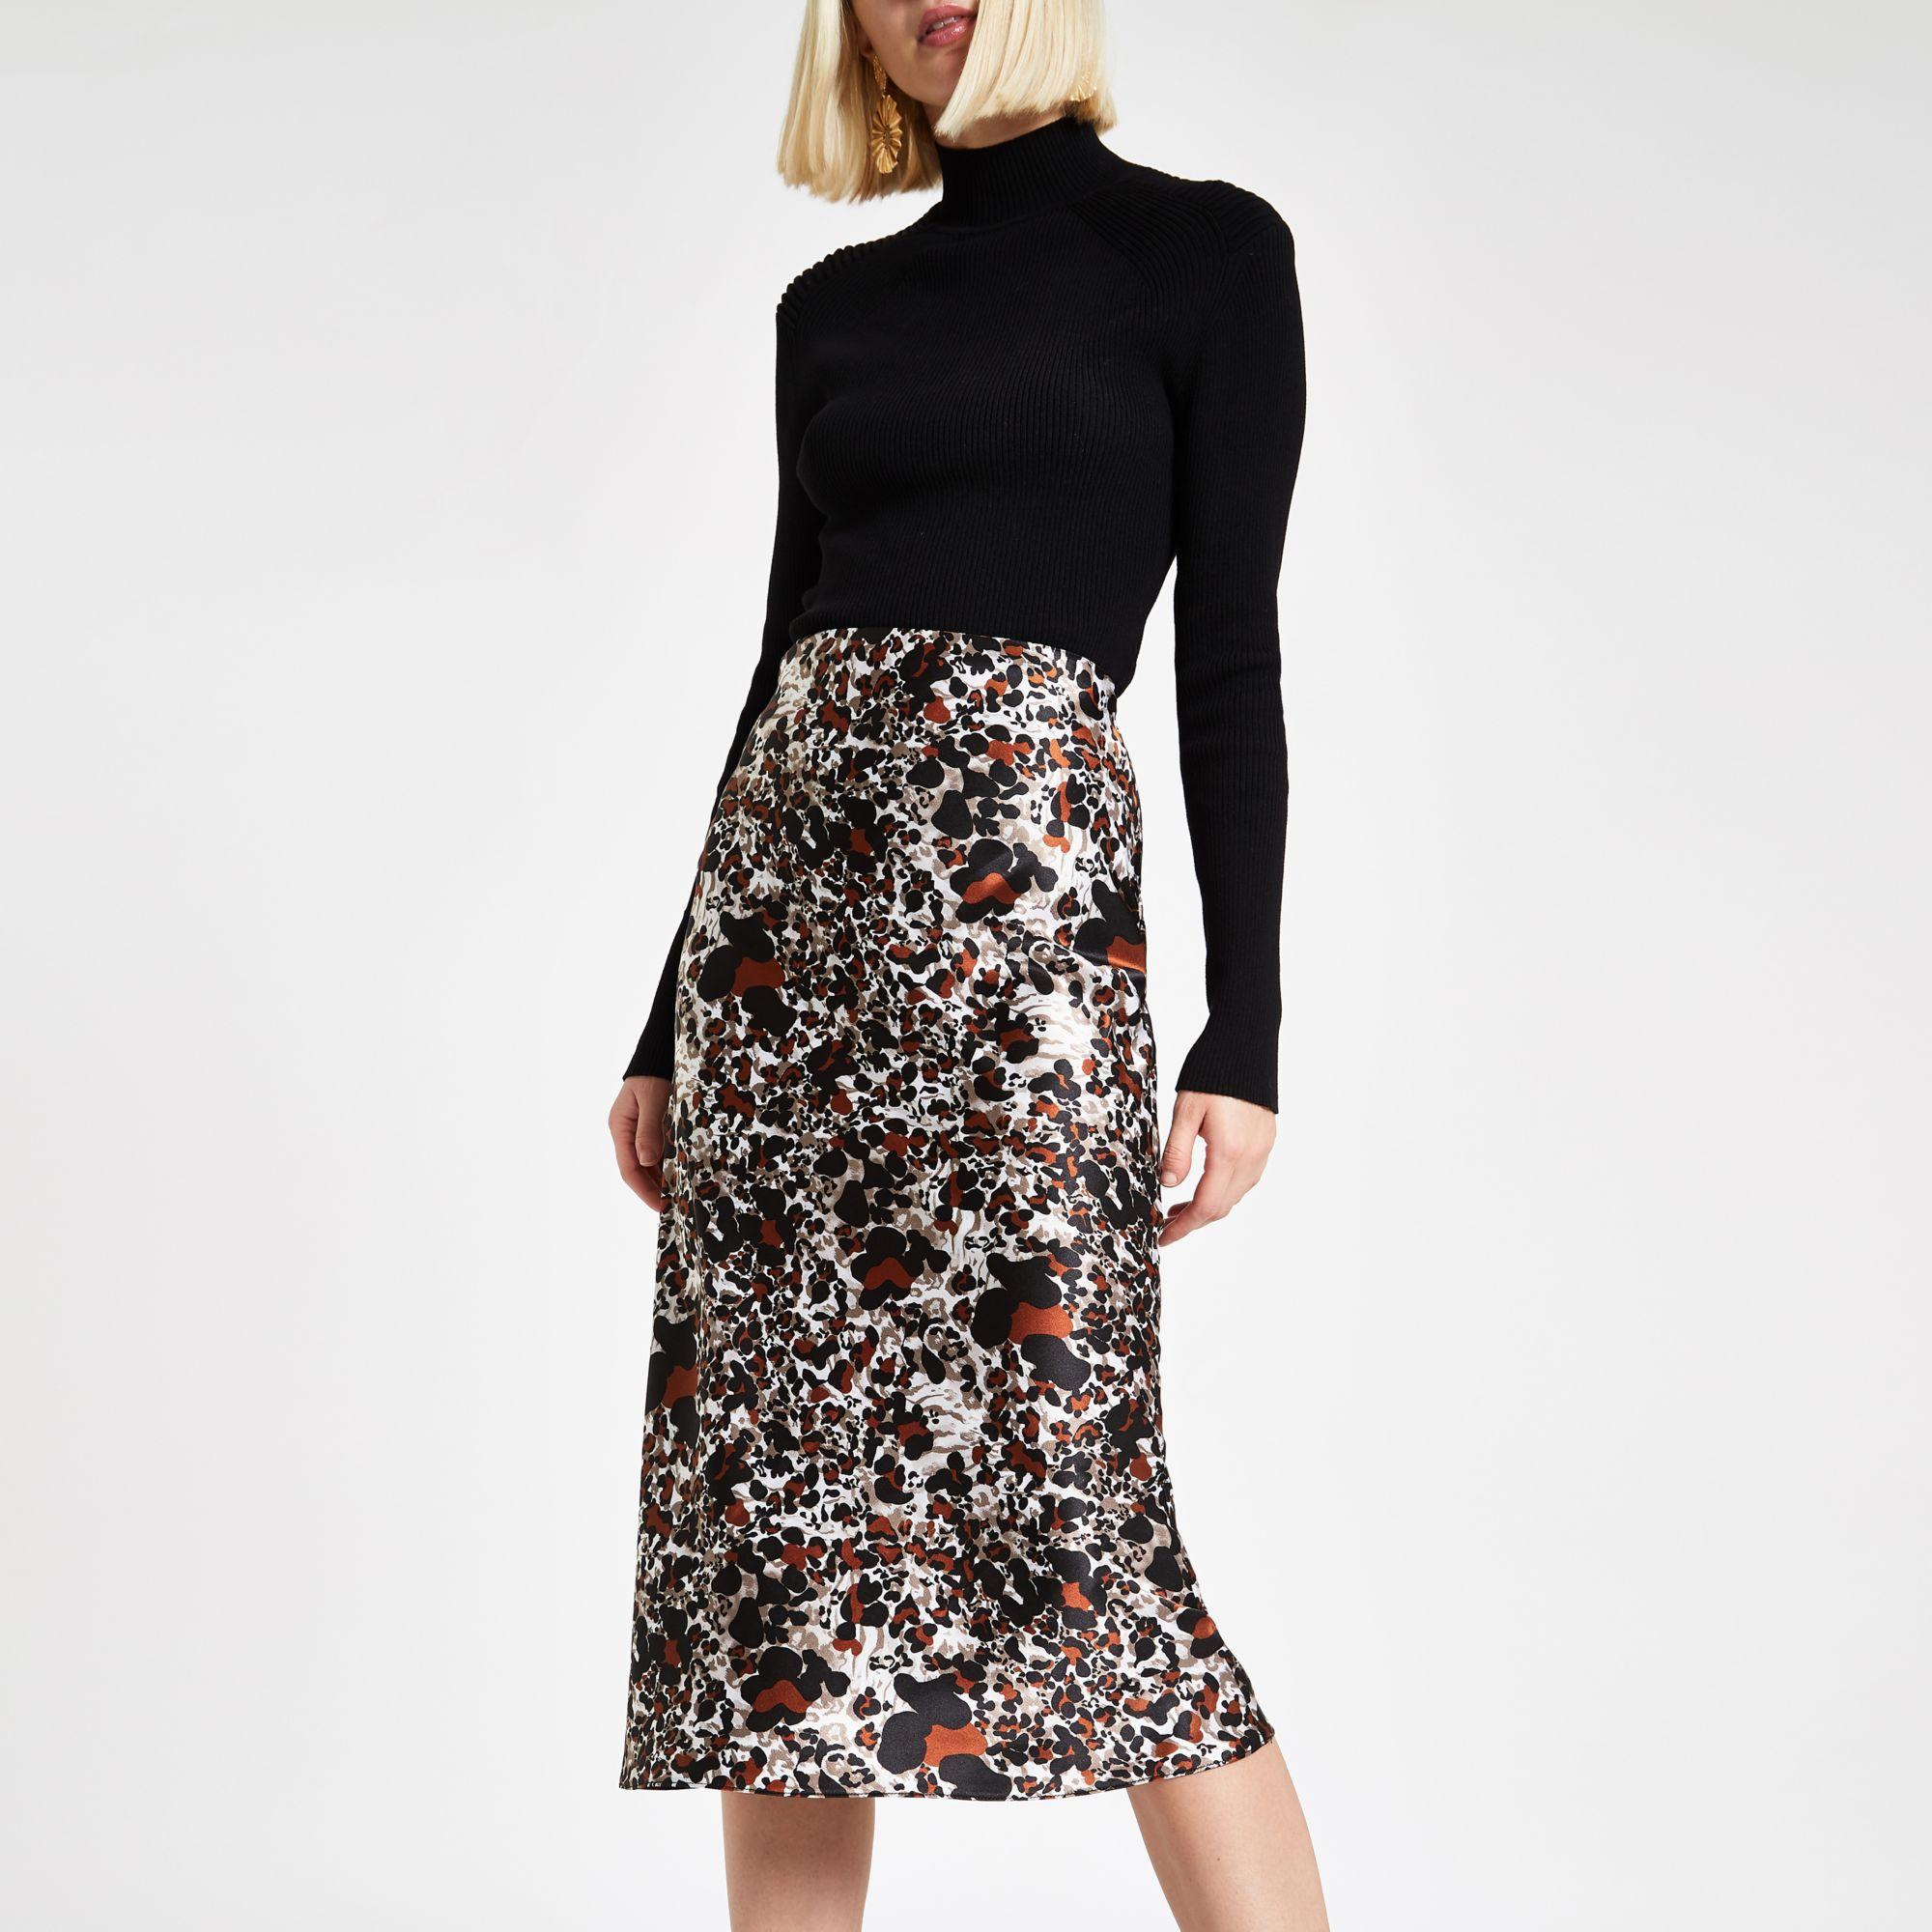 huge selection of genuine top-rated newest River Island Brown Rust Leopard Print Bias Cut Midi Skirt